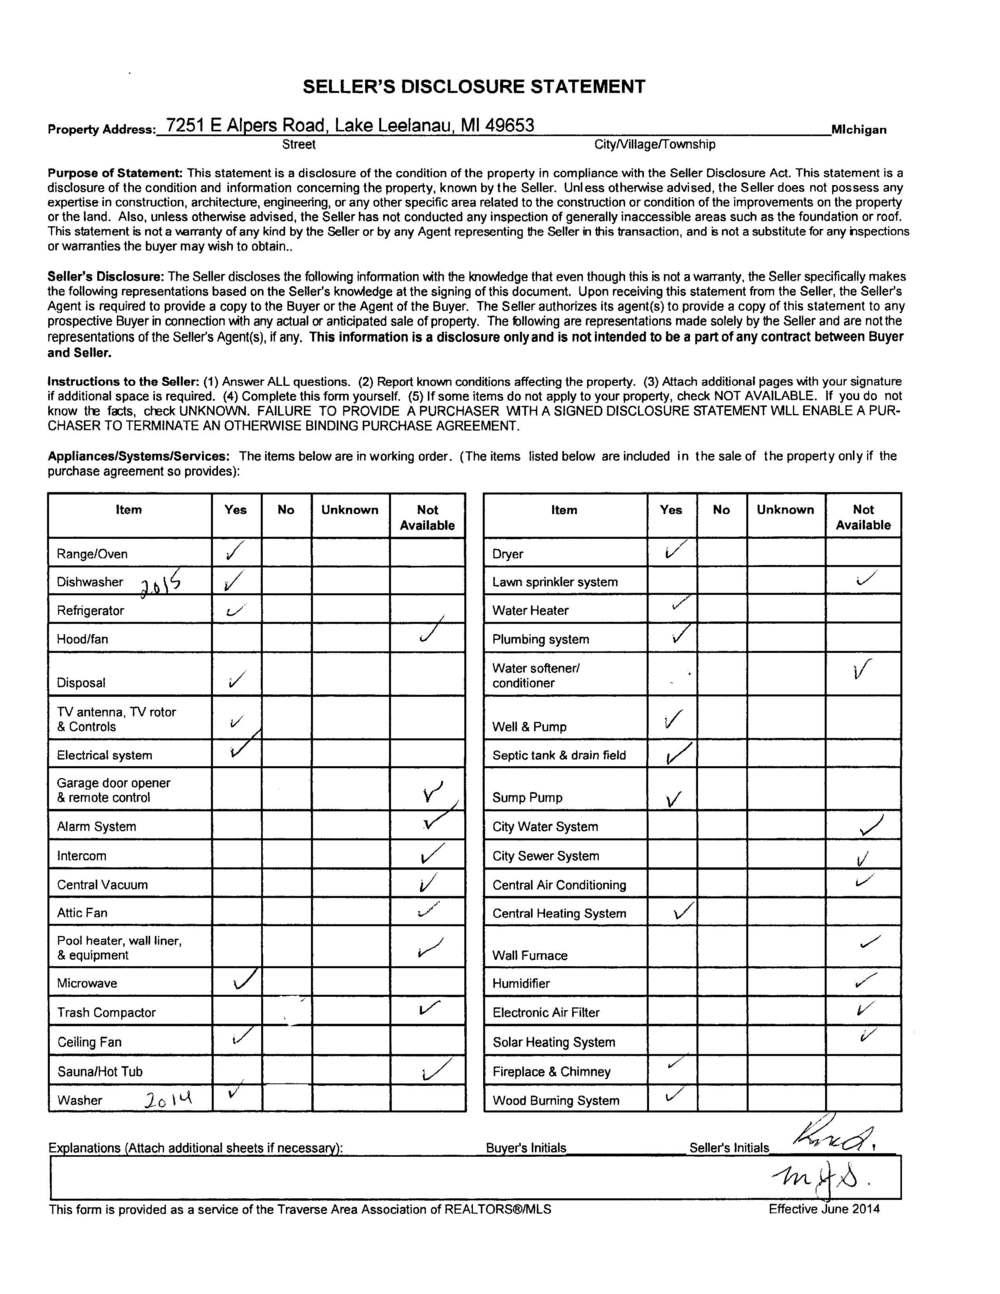 7251 E Alpers Road, Lake Leelanau, MI – Historic 1865 Centennial Inn For Sale By Oltersdorf Realty LLC Information Packet (9).jpg